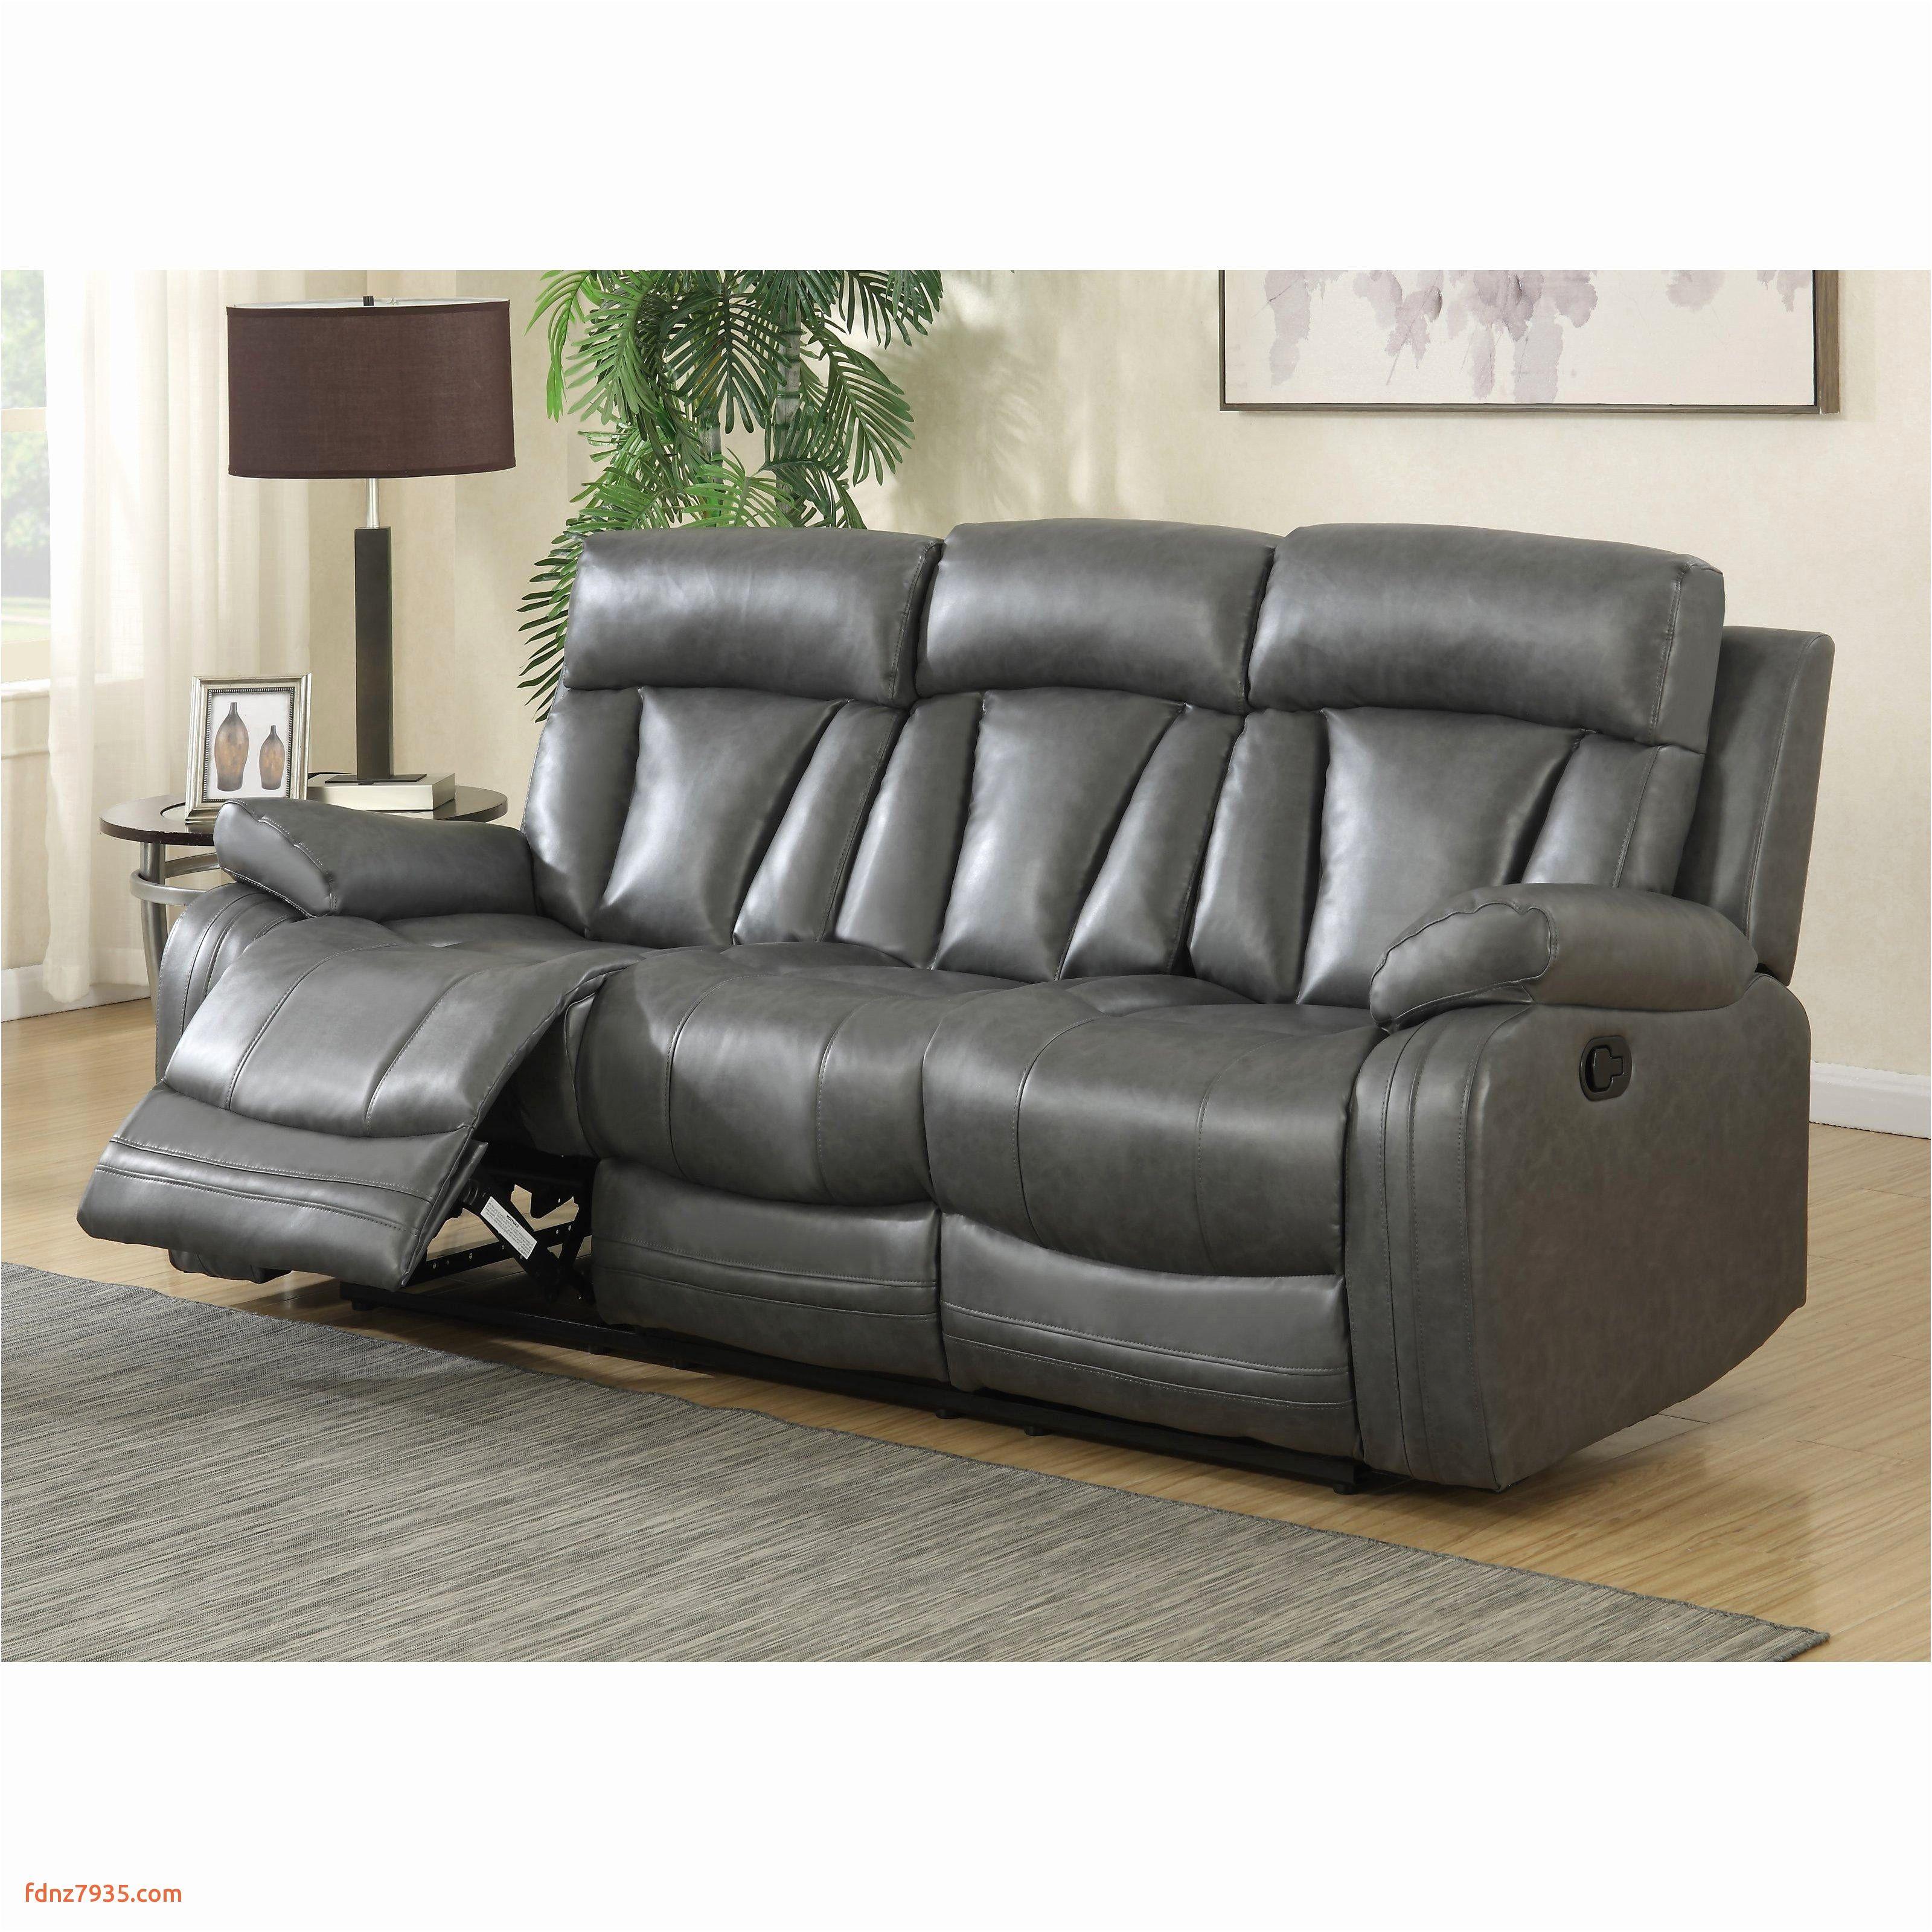 Minimalist Sofa Gross Couch Mobel Di 2018 Pinterest Furniture